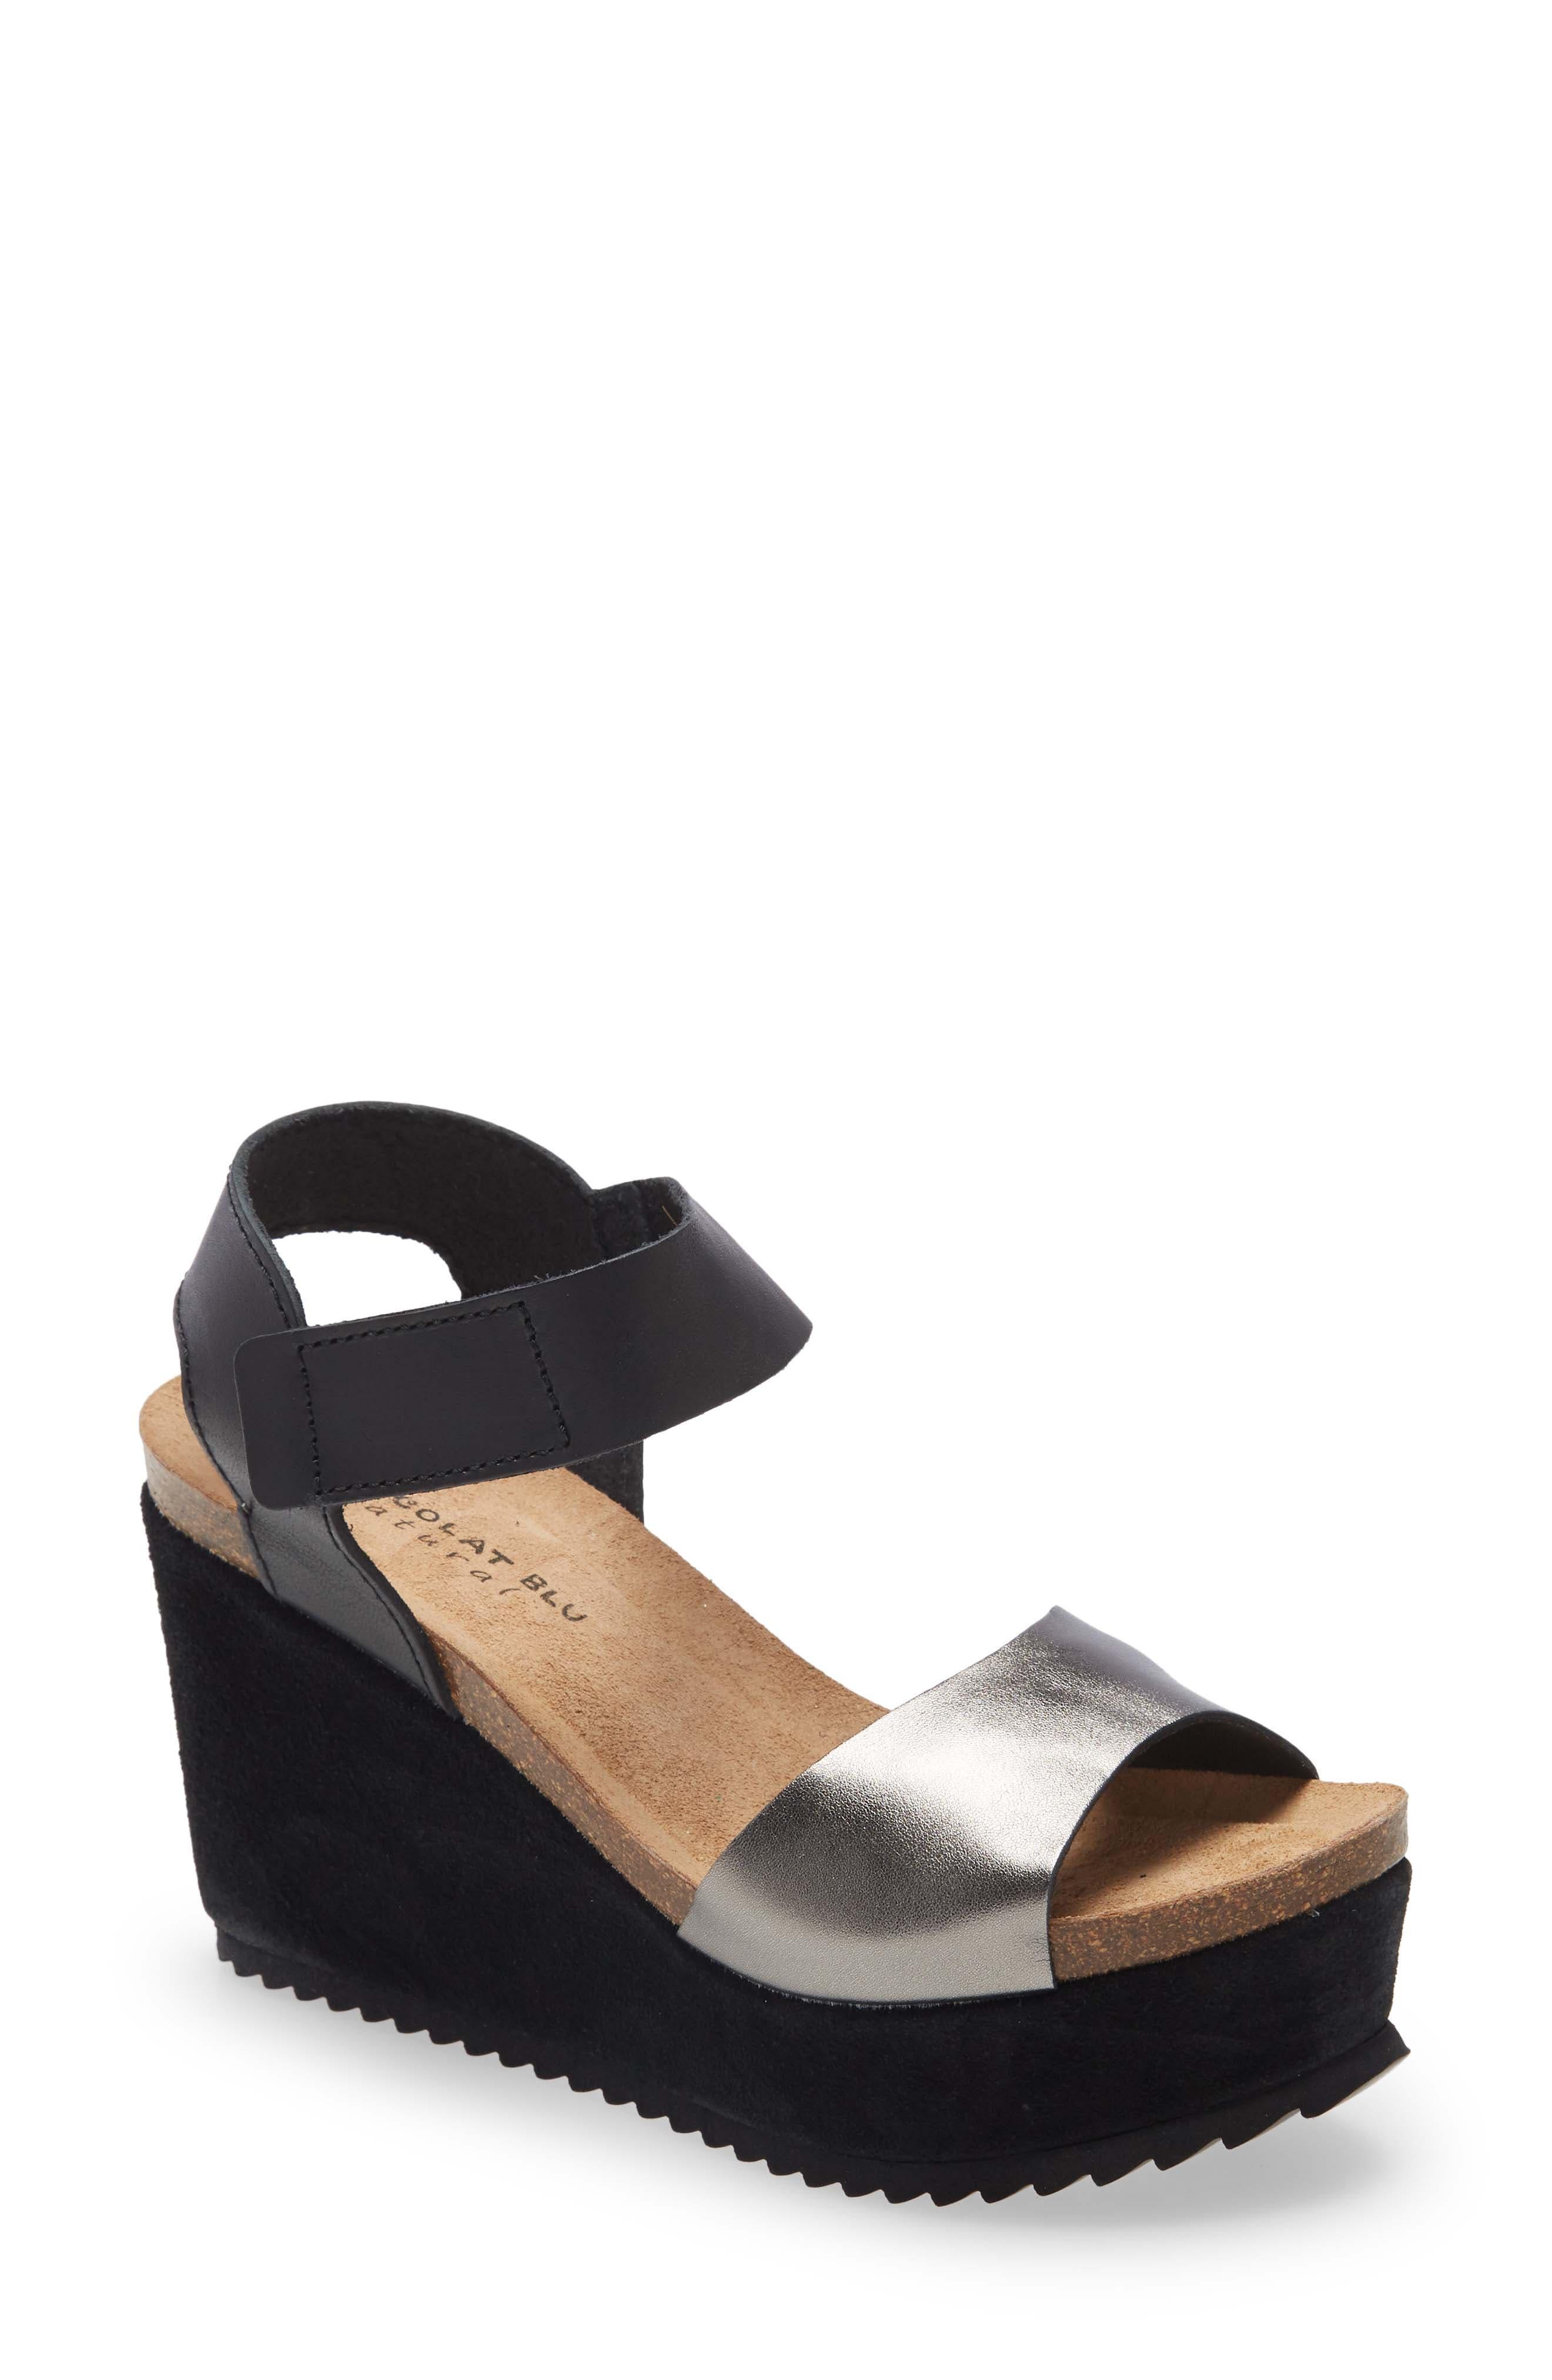 Miana Platform Wedge Sandal